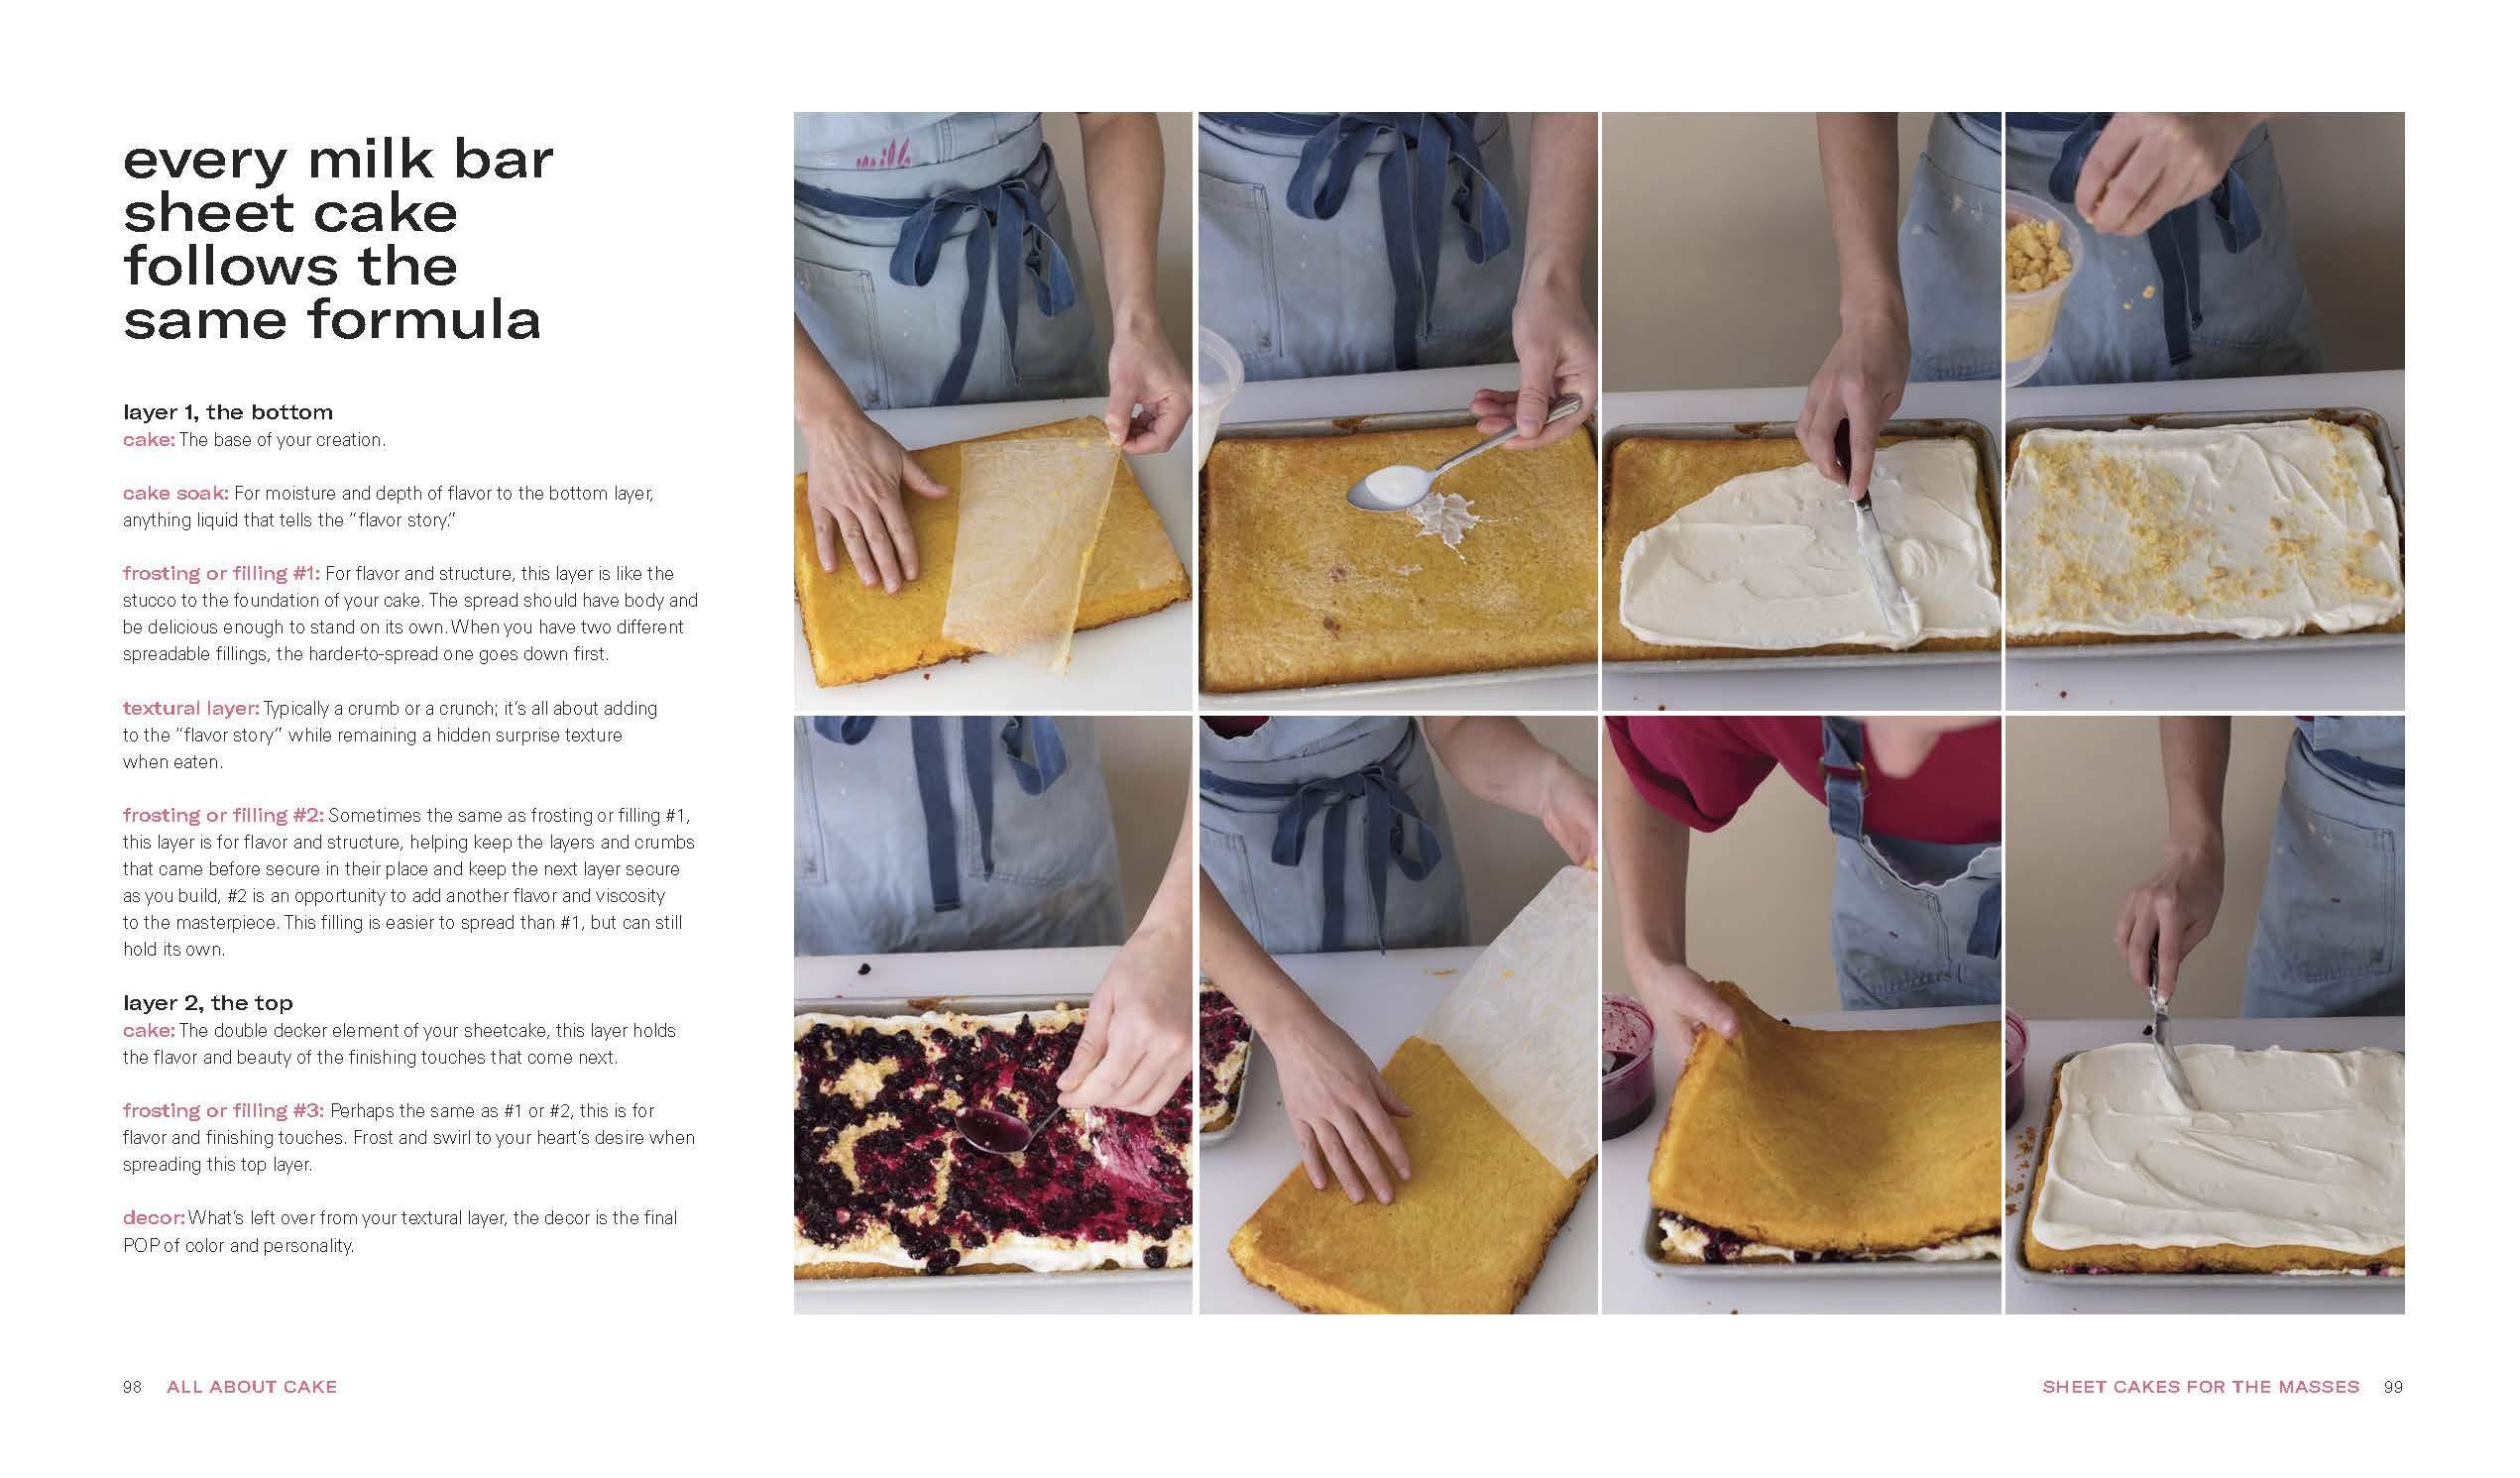 All About Cake Christina Tosi 9780451499523 Amazon Books